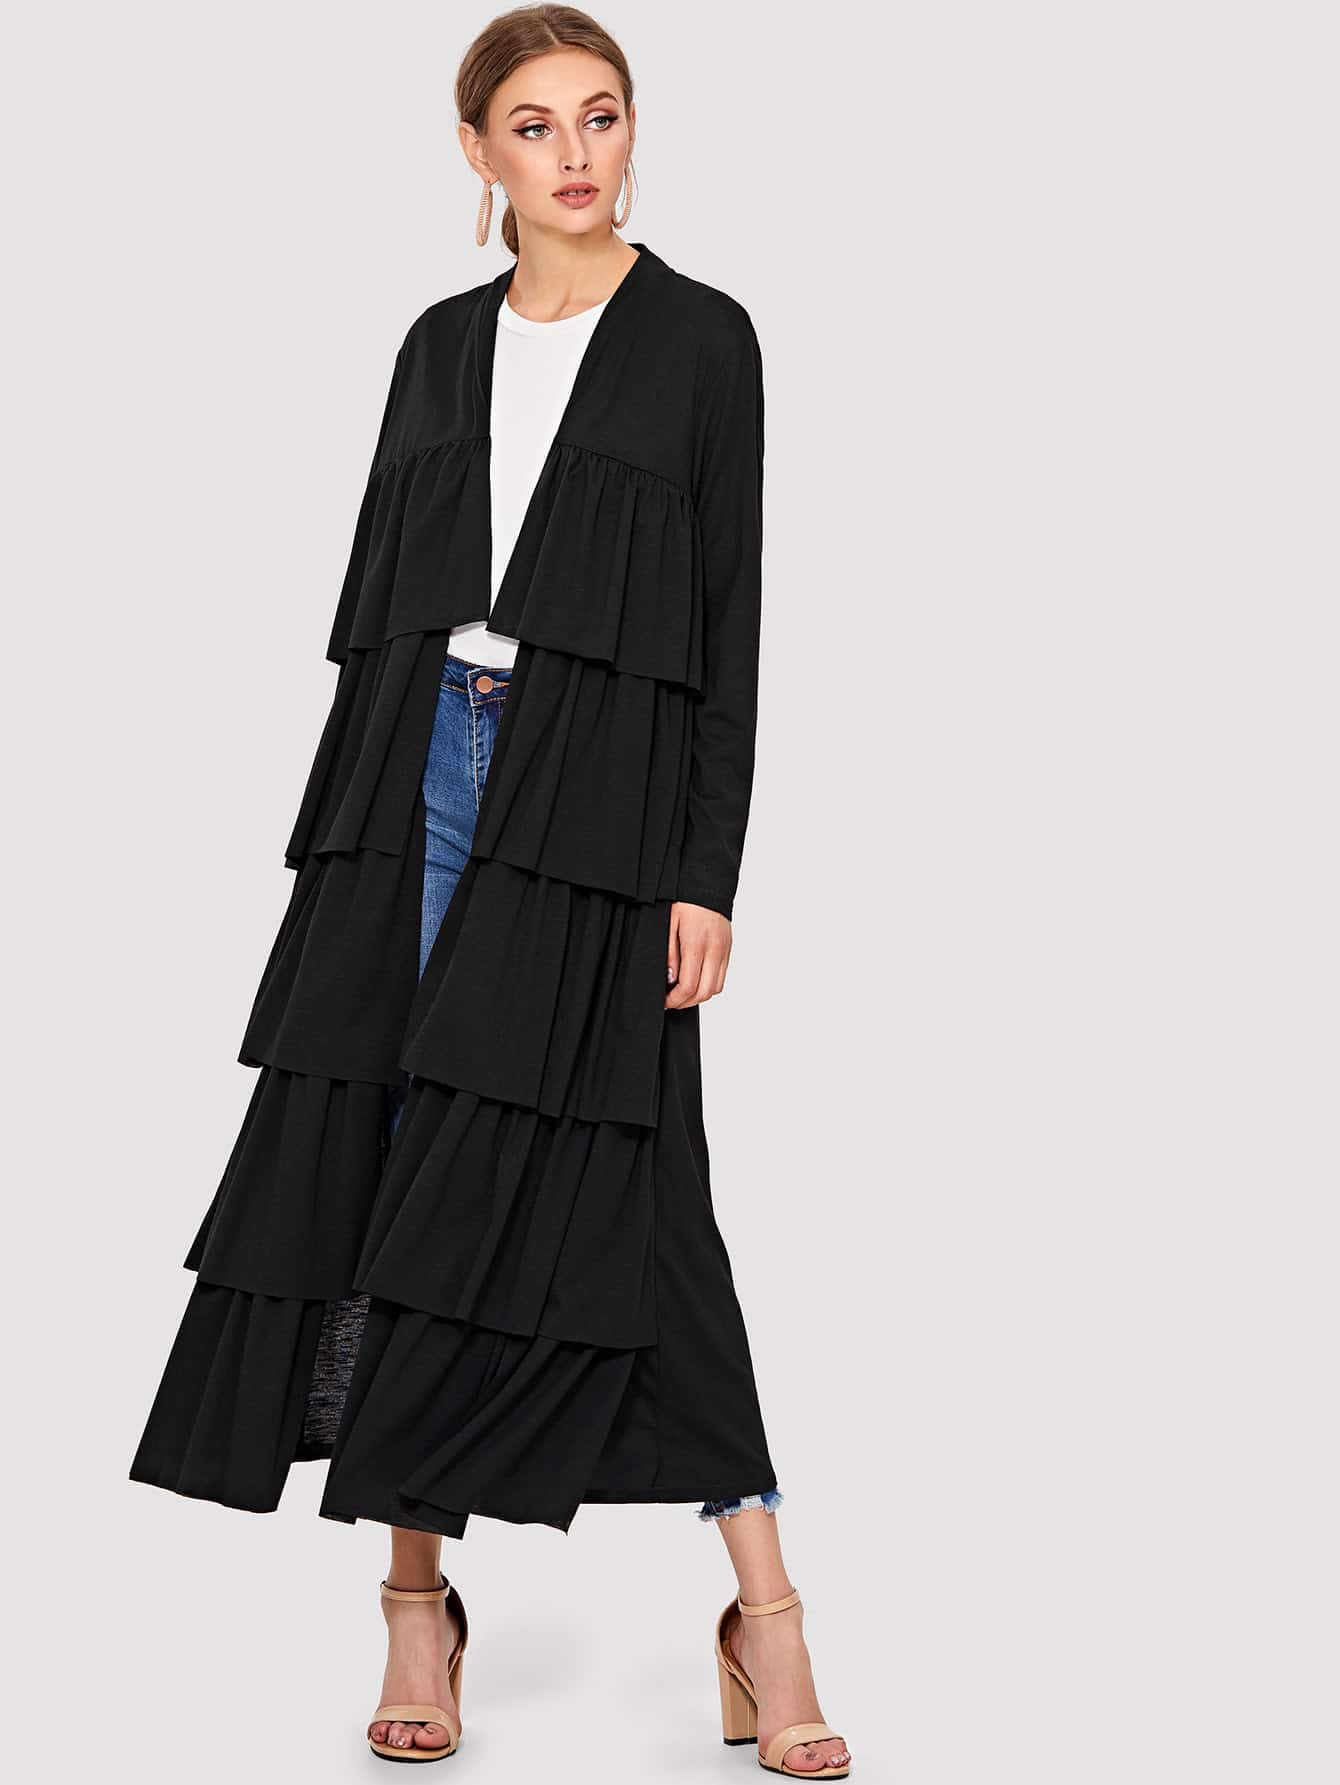 Tiered Ruffle Solid Abaya tiered layer ruffle jacket